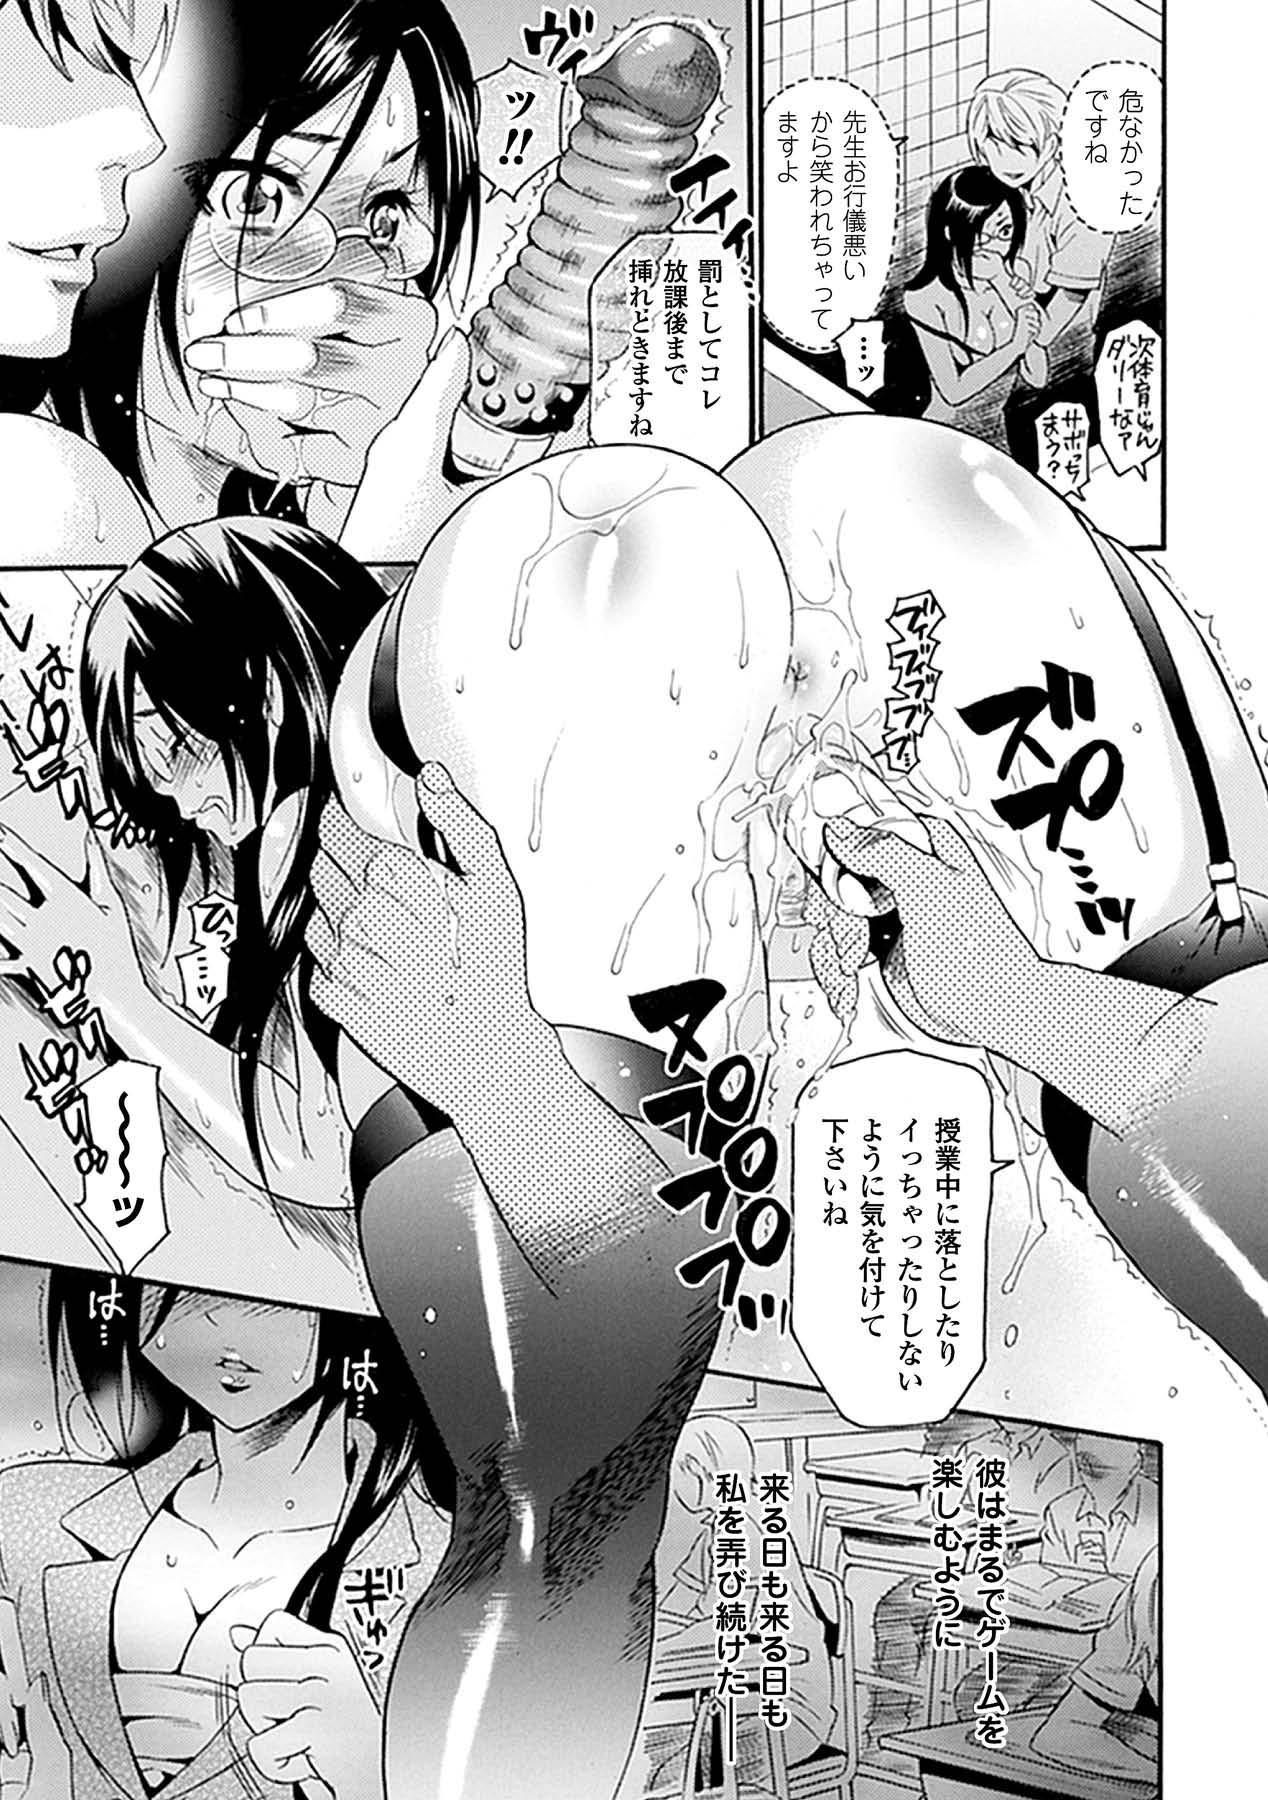 Kyousei Roshutsu Vol.1 Digital 32